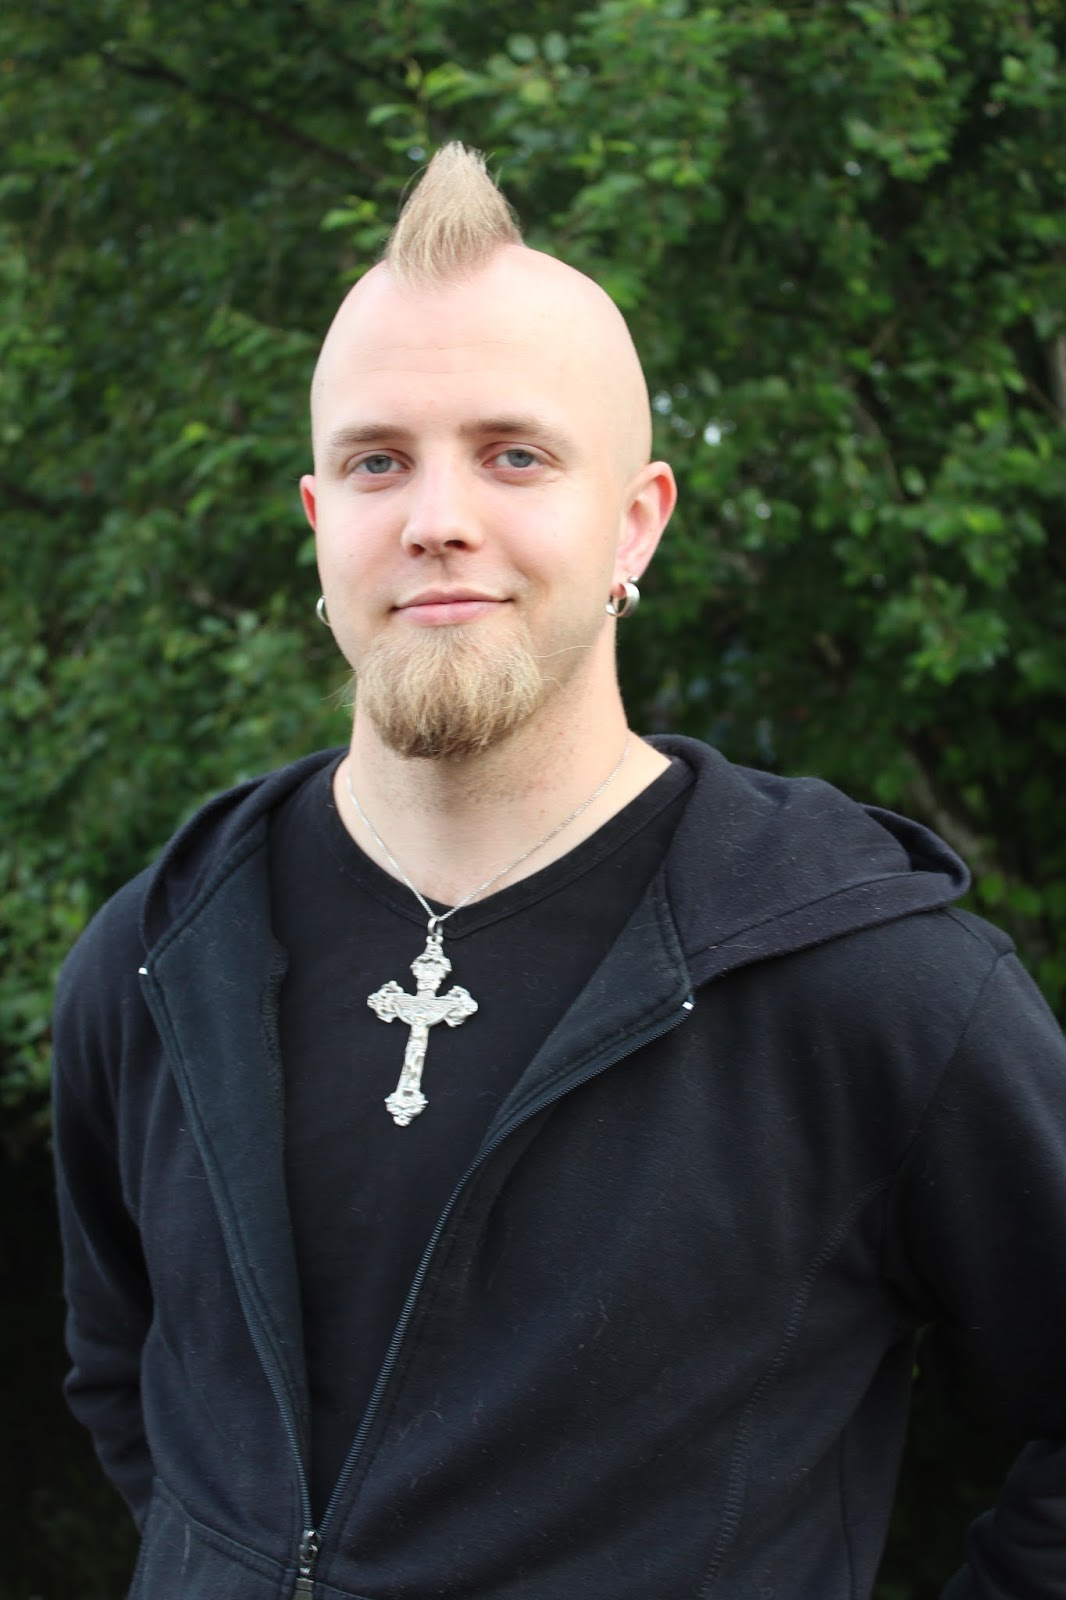 Matti Kankaanniemi